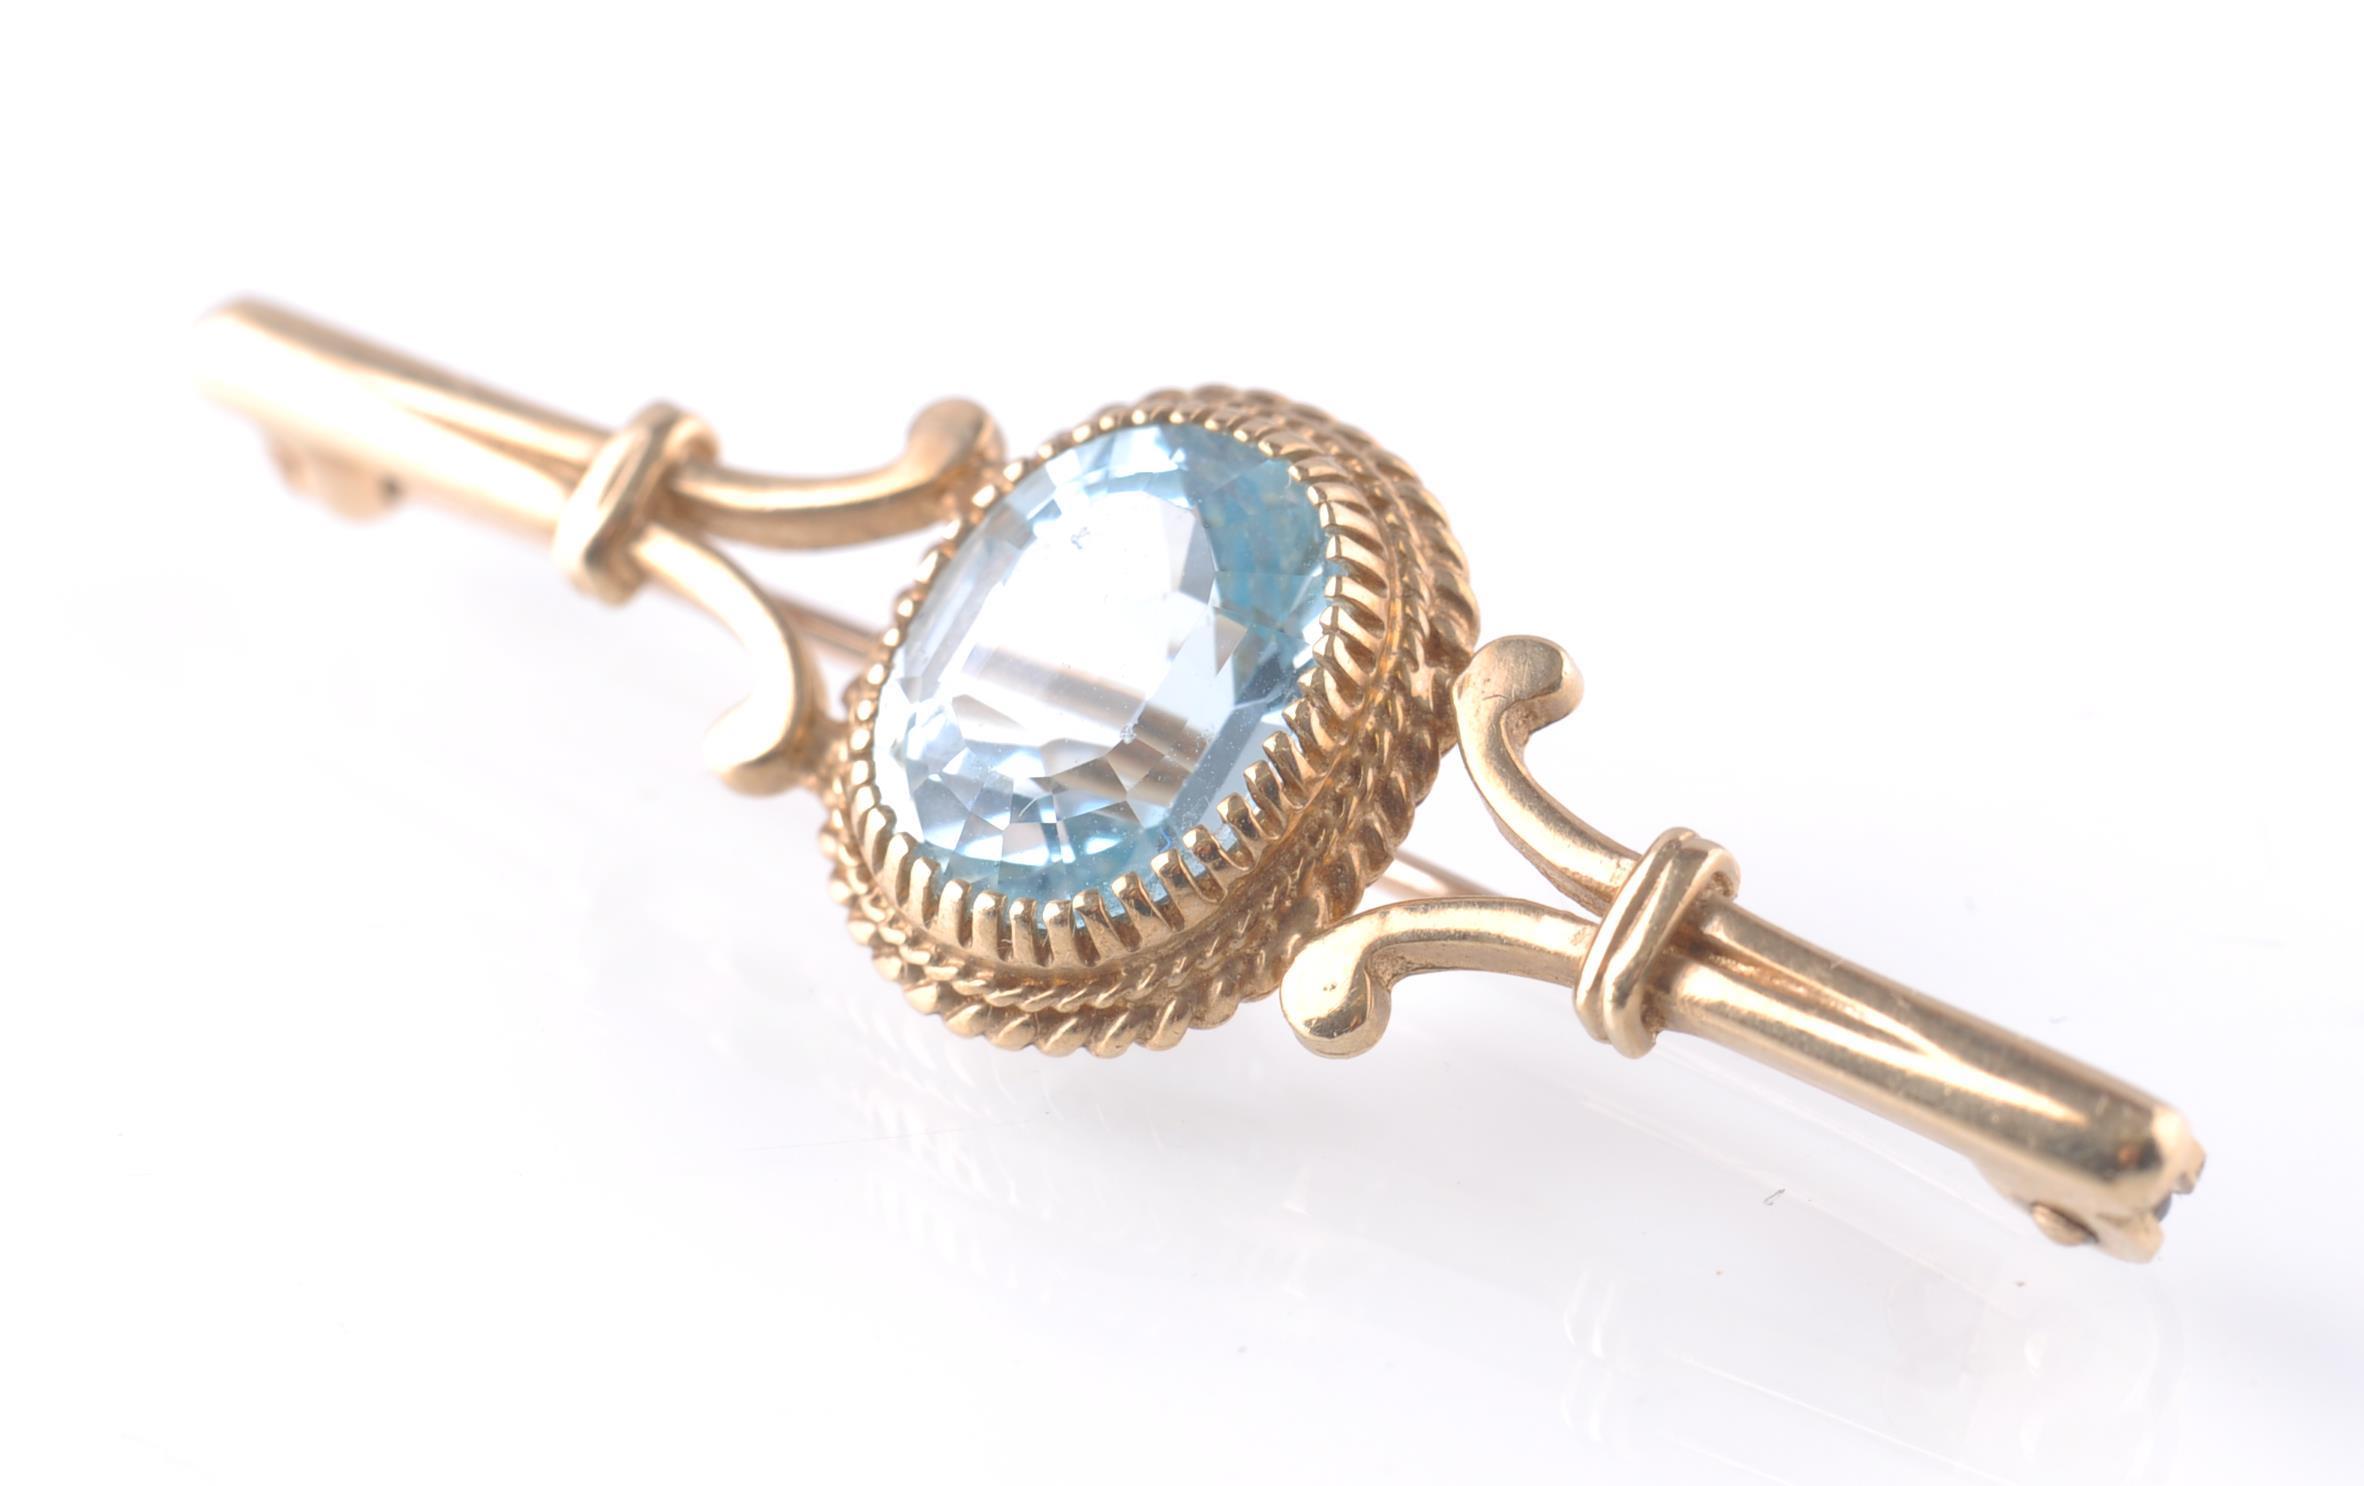 9CT GOLD HALLMARKED LADIES BLUE QUARTZ STONE BAR B